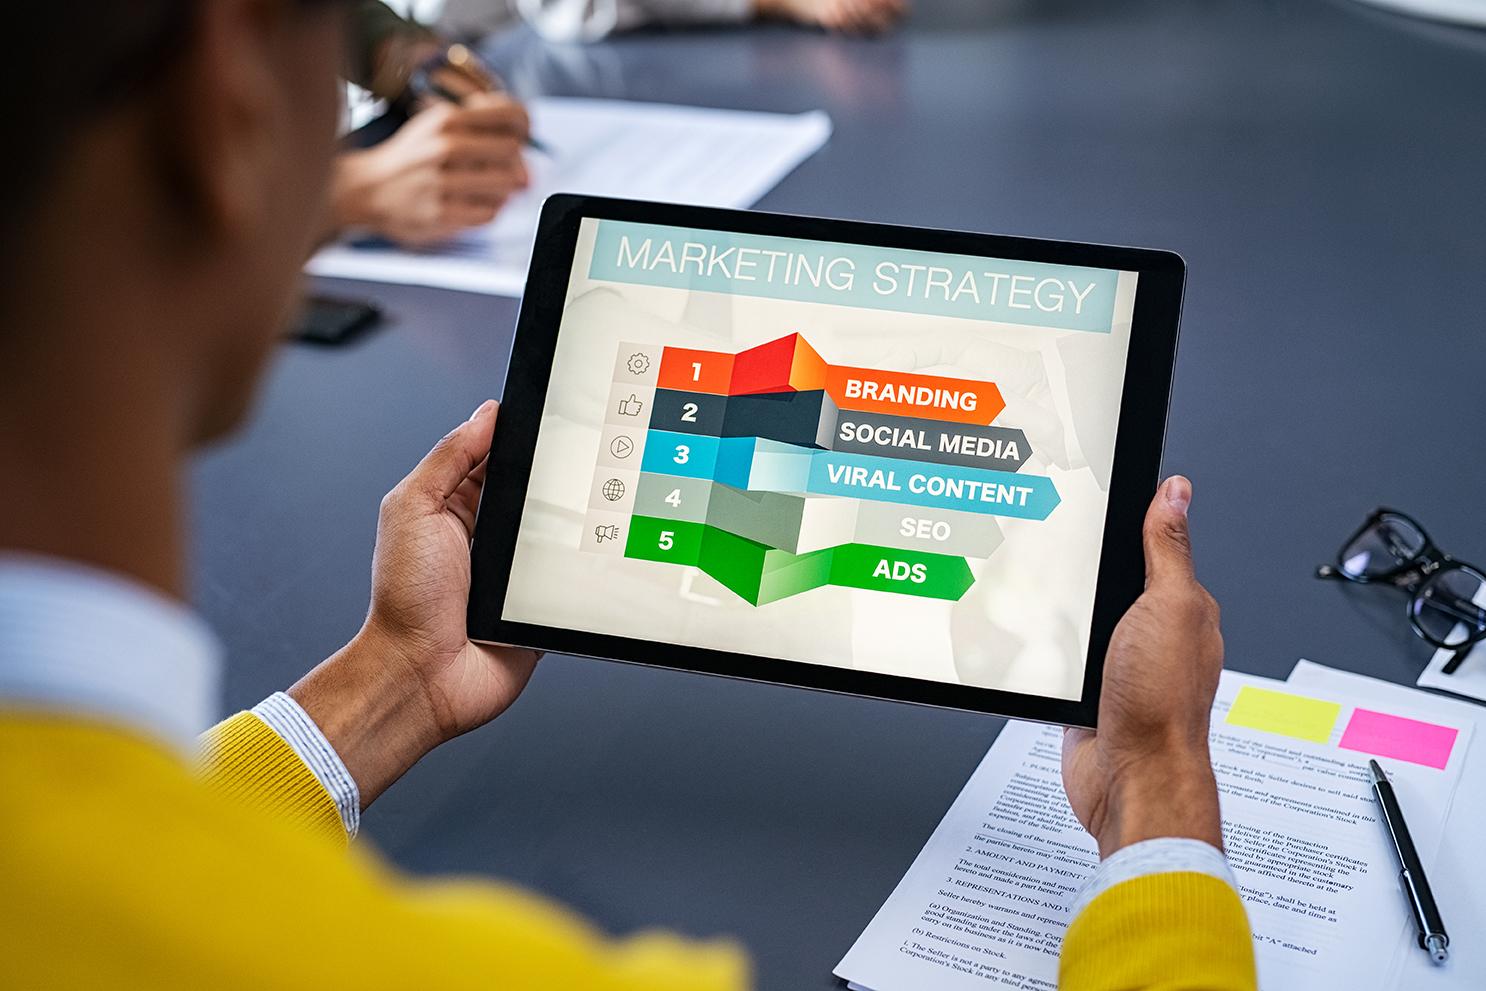 strategi pemasaran bisnis online cara memulai jualan online - digital marketing strategy N7XCHV3 - Cara Memulai Jualan Online